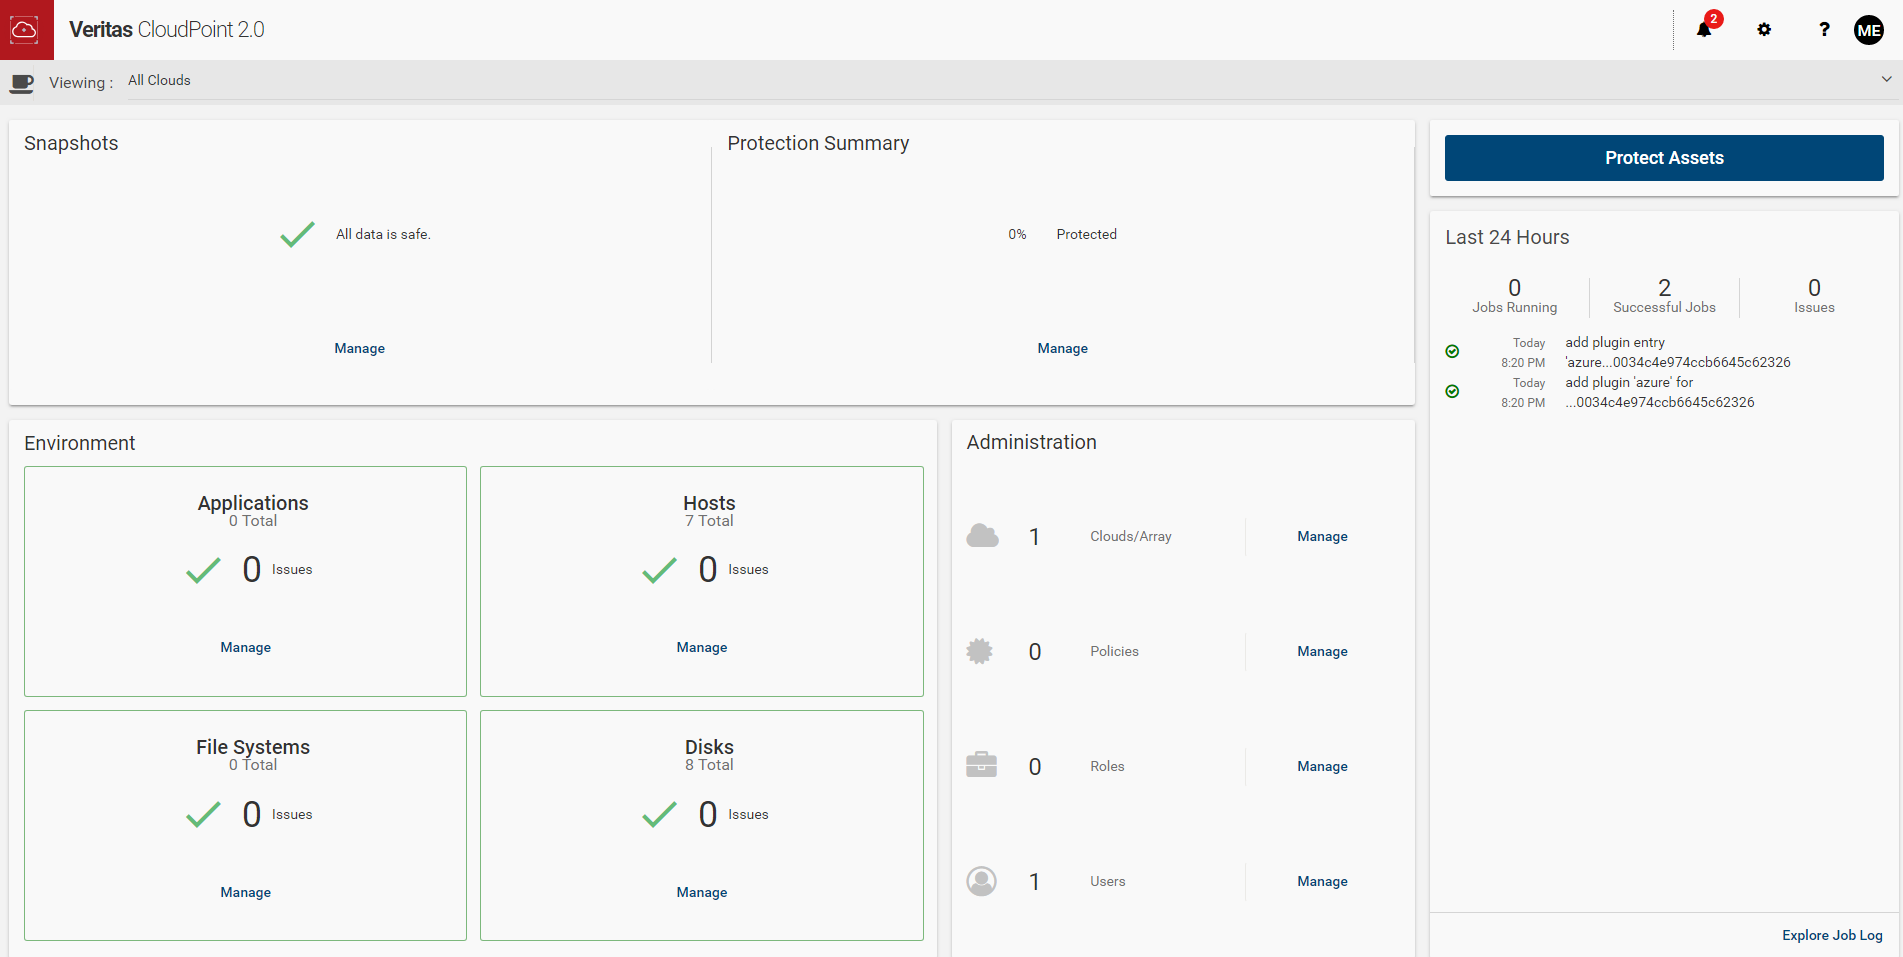 Machine generated alternative text: Veritas CloudPoint 2.0